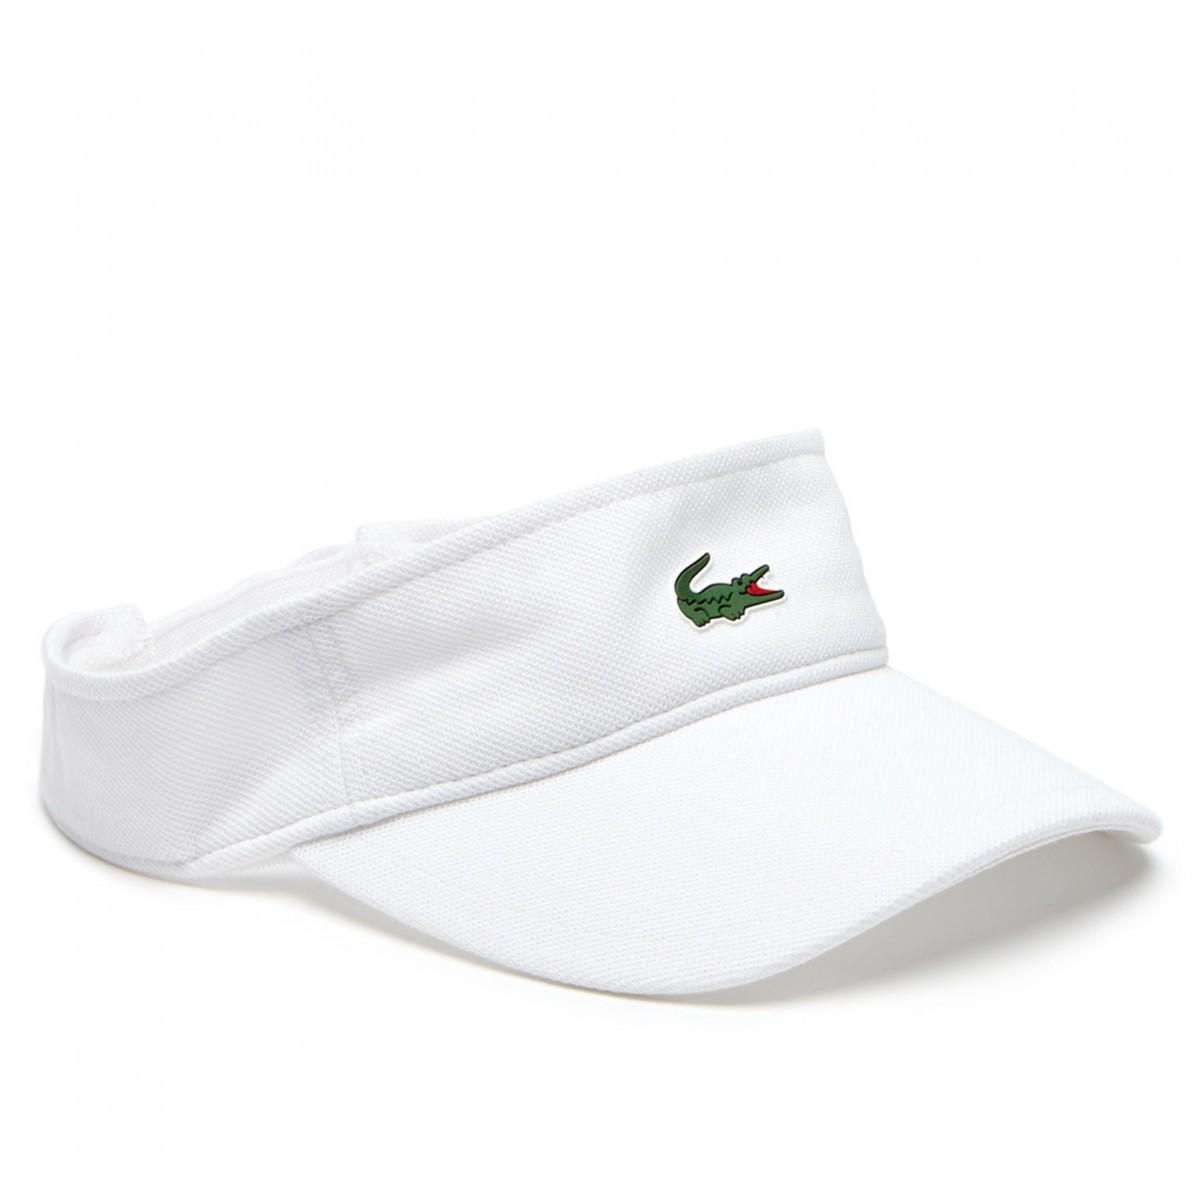 a6f98db8fef67 Lacoste Mens RK3553 Adjustable Pique Cotton Visor Golf Cap